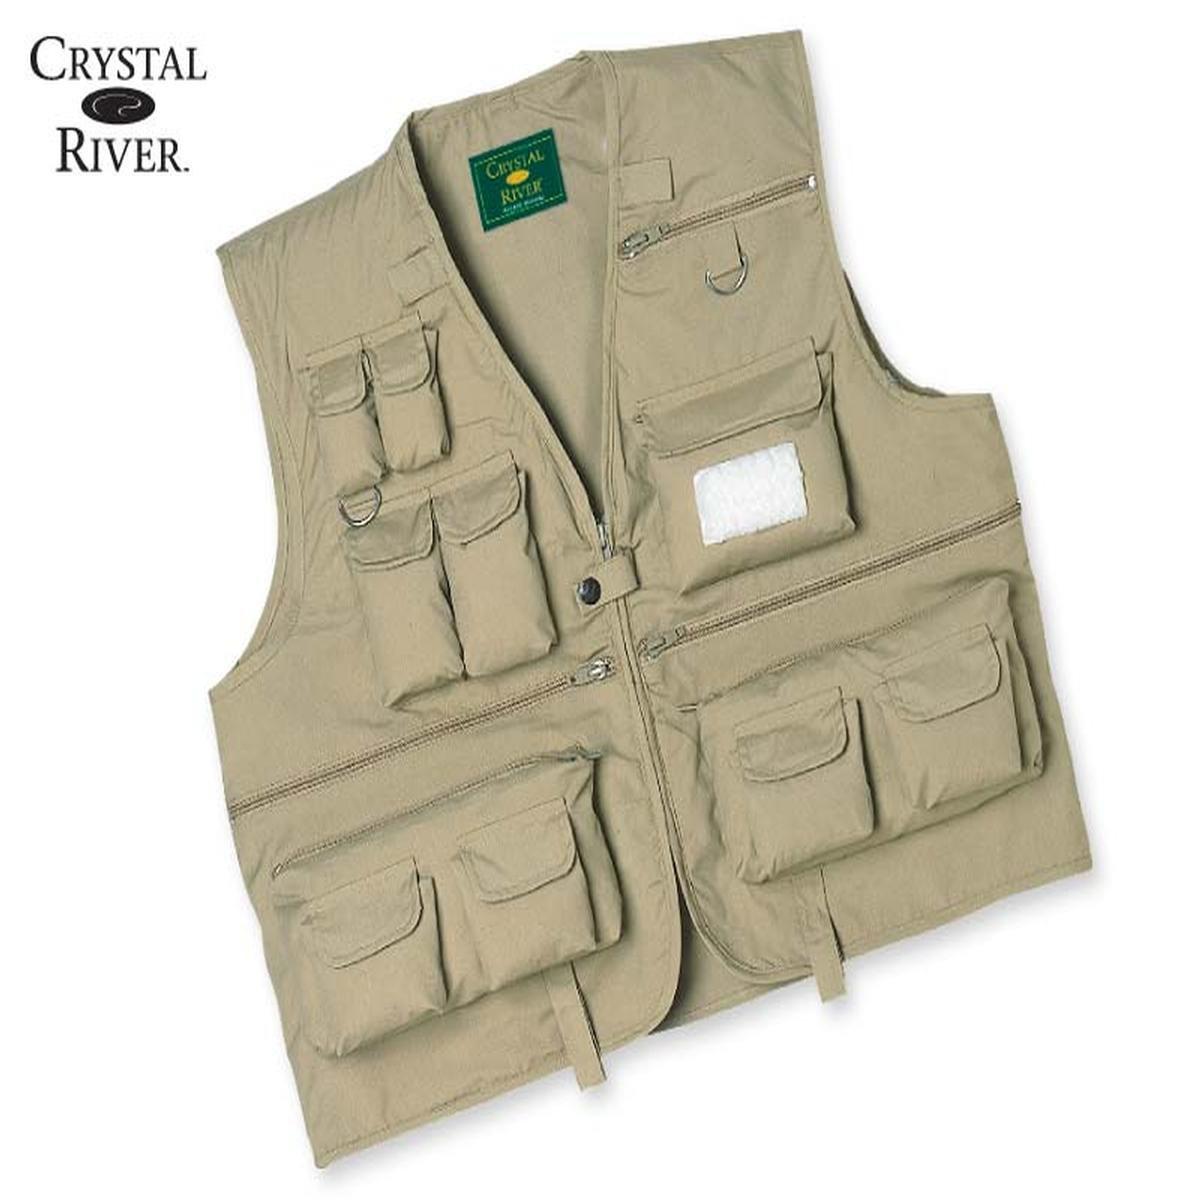 Crystal river c r fly fishing vest khaki xx large for Fishing vest amazon